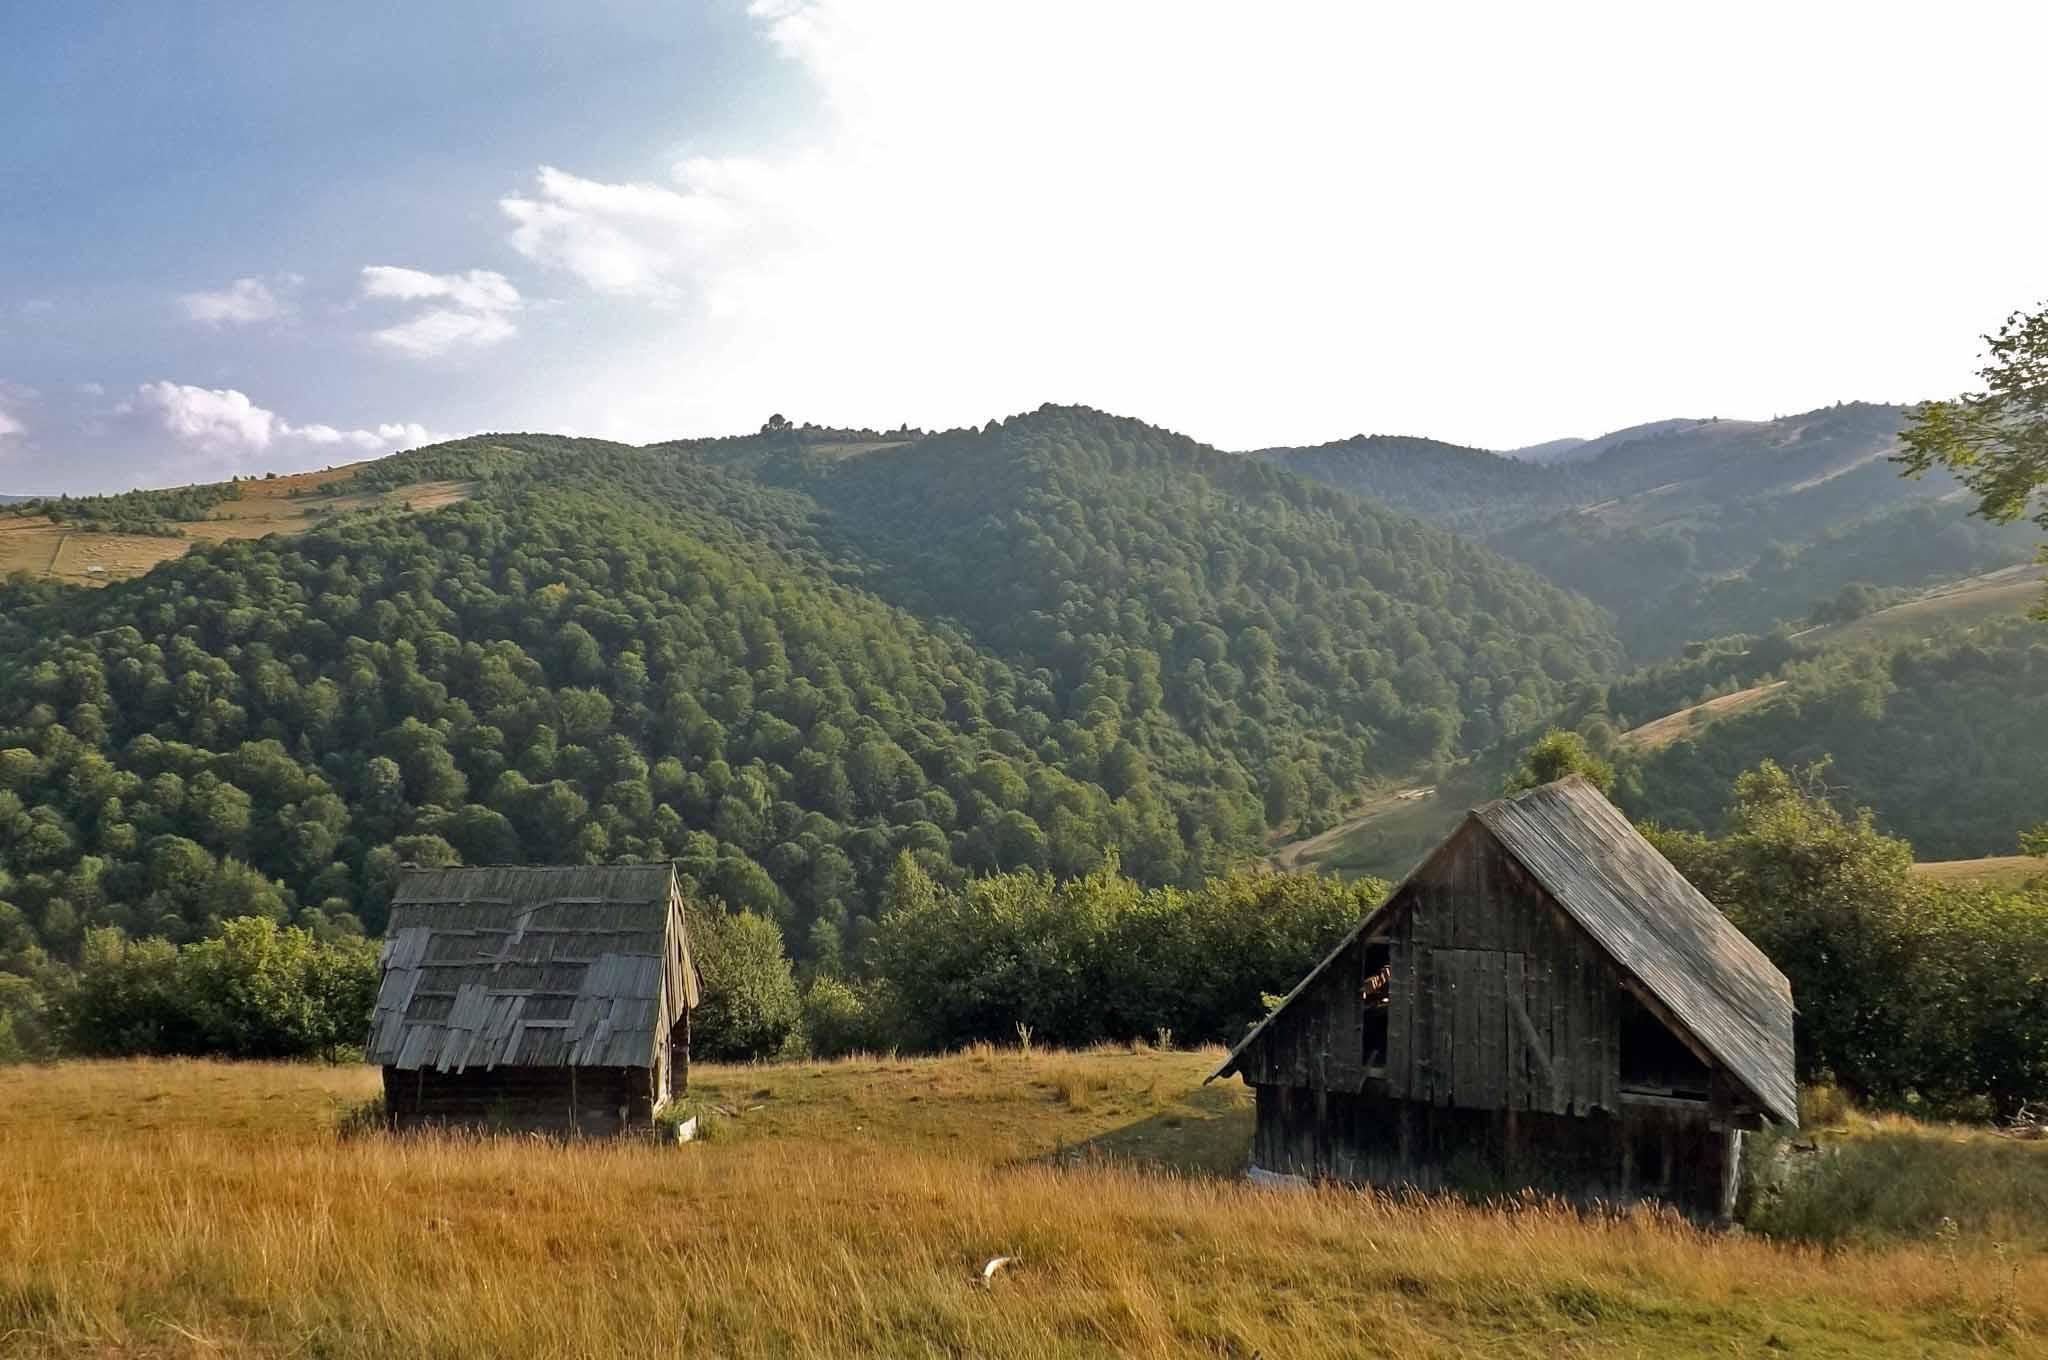 shepherds hut romania mountain shelter transylvania